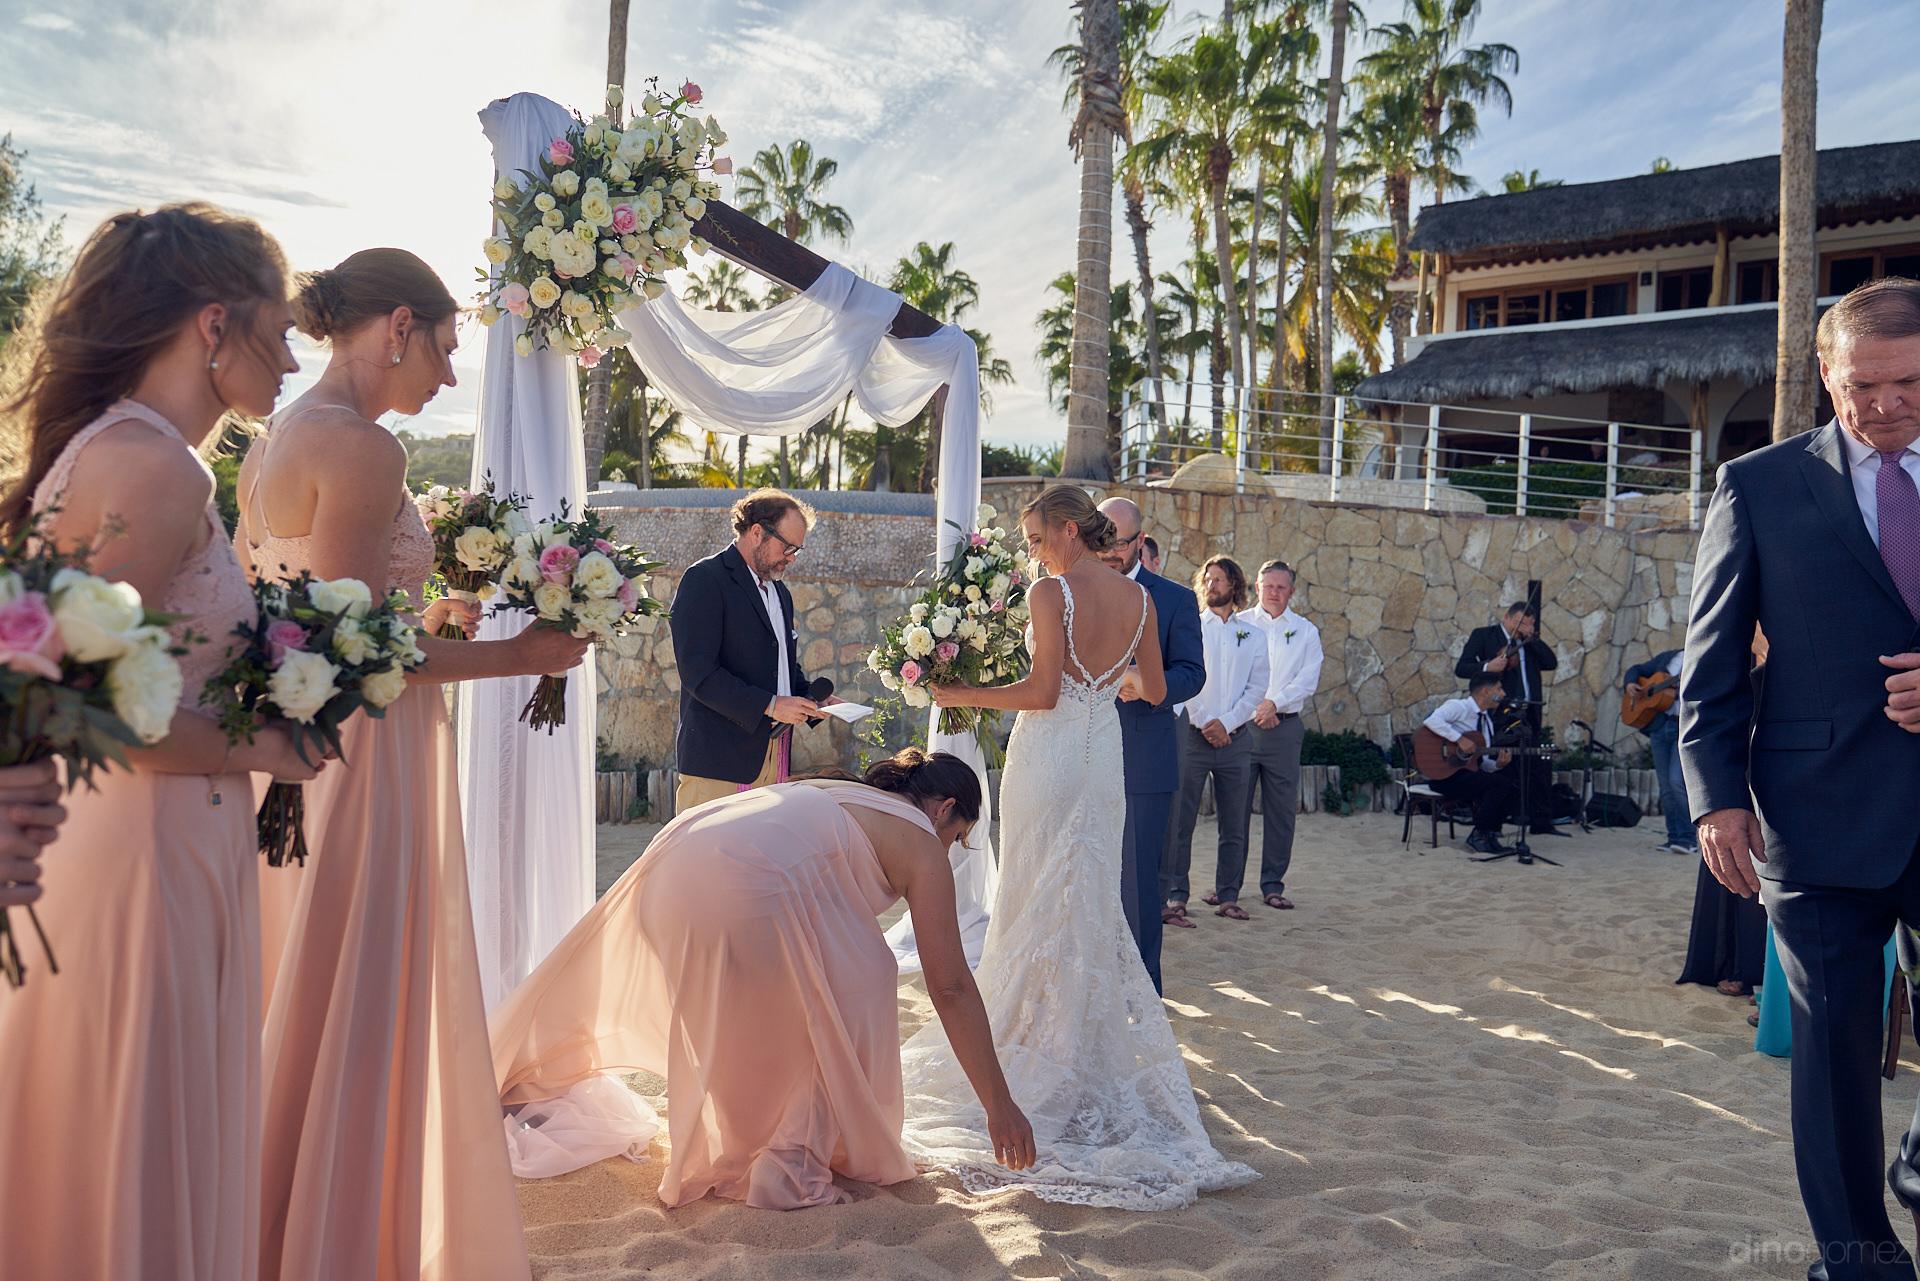 Cabo Wedding Videographer Meme At A Beautiful Wedding - Mm